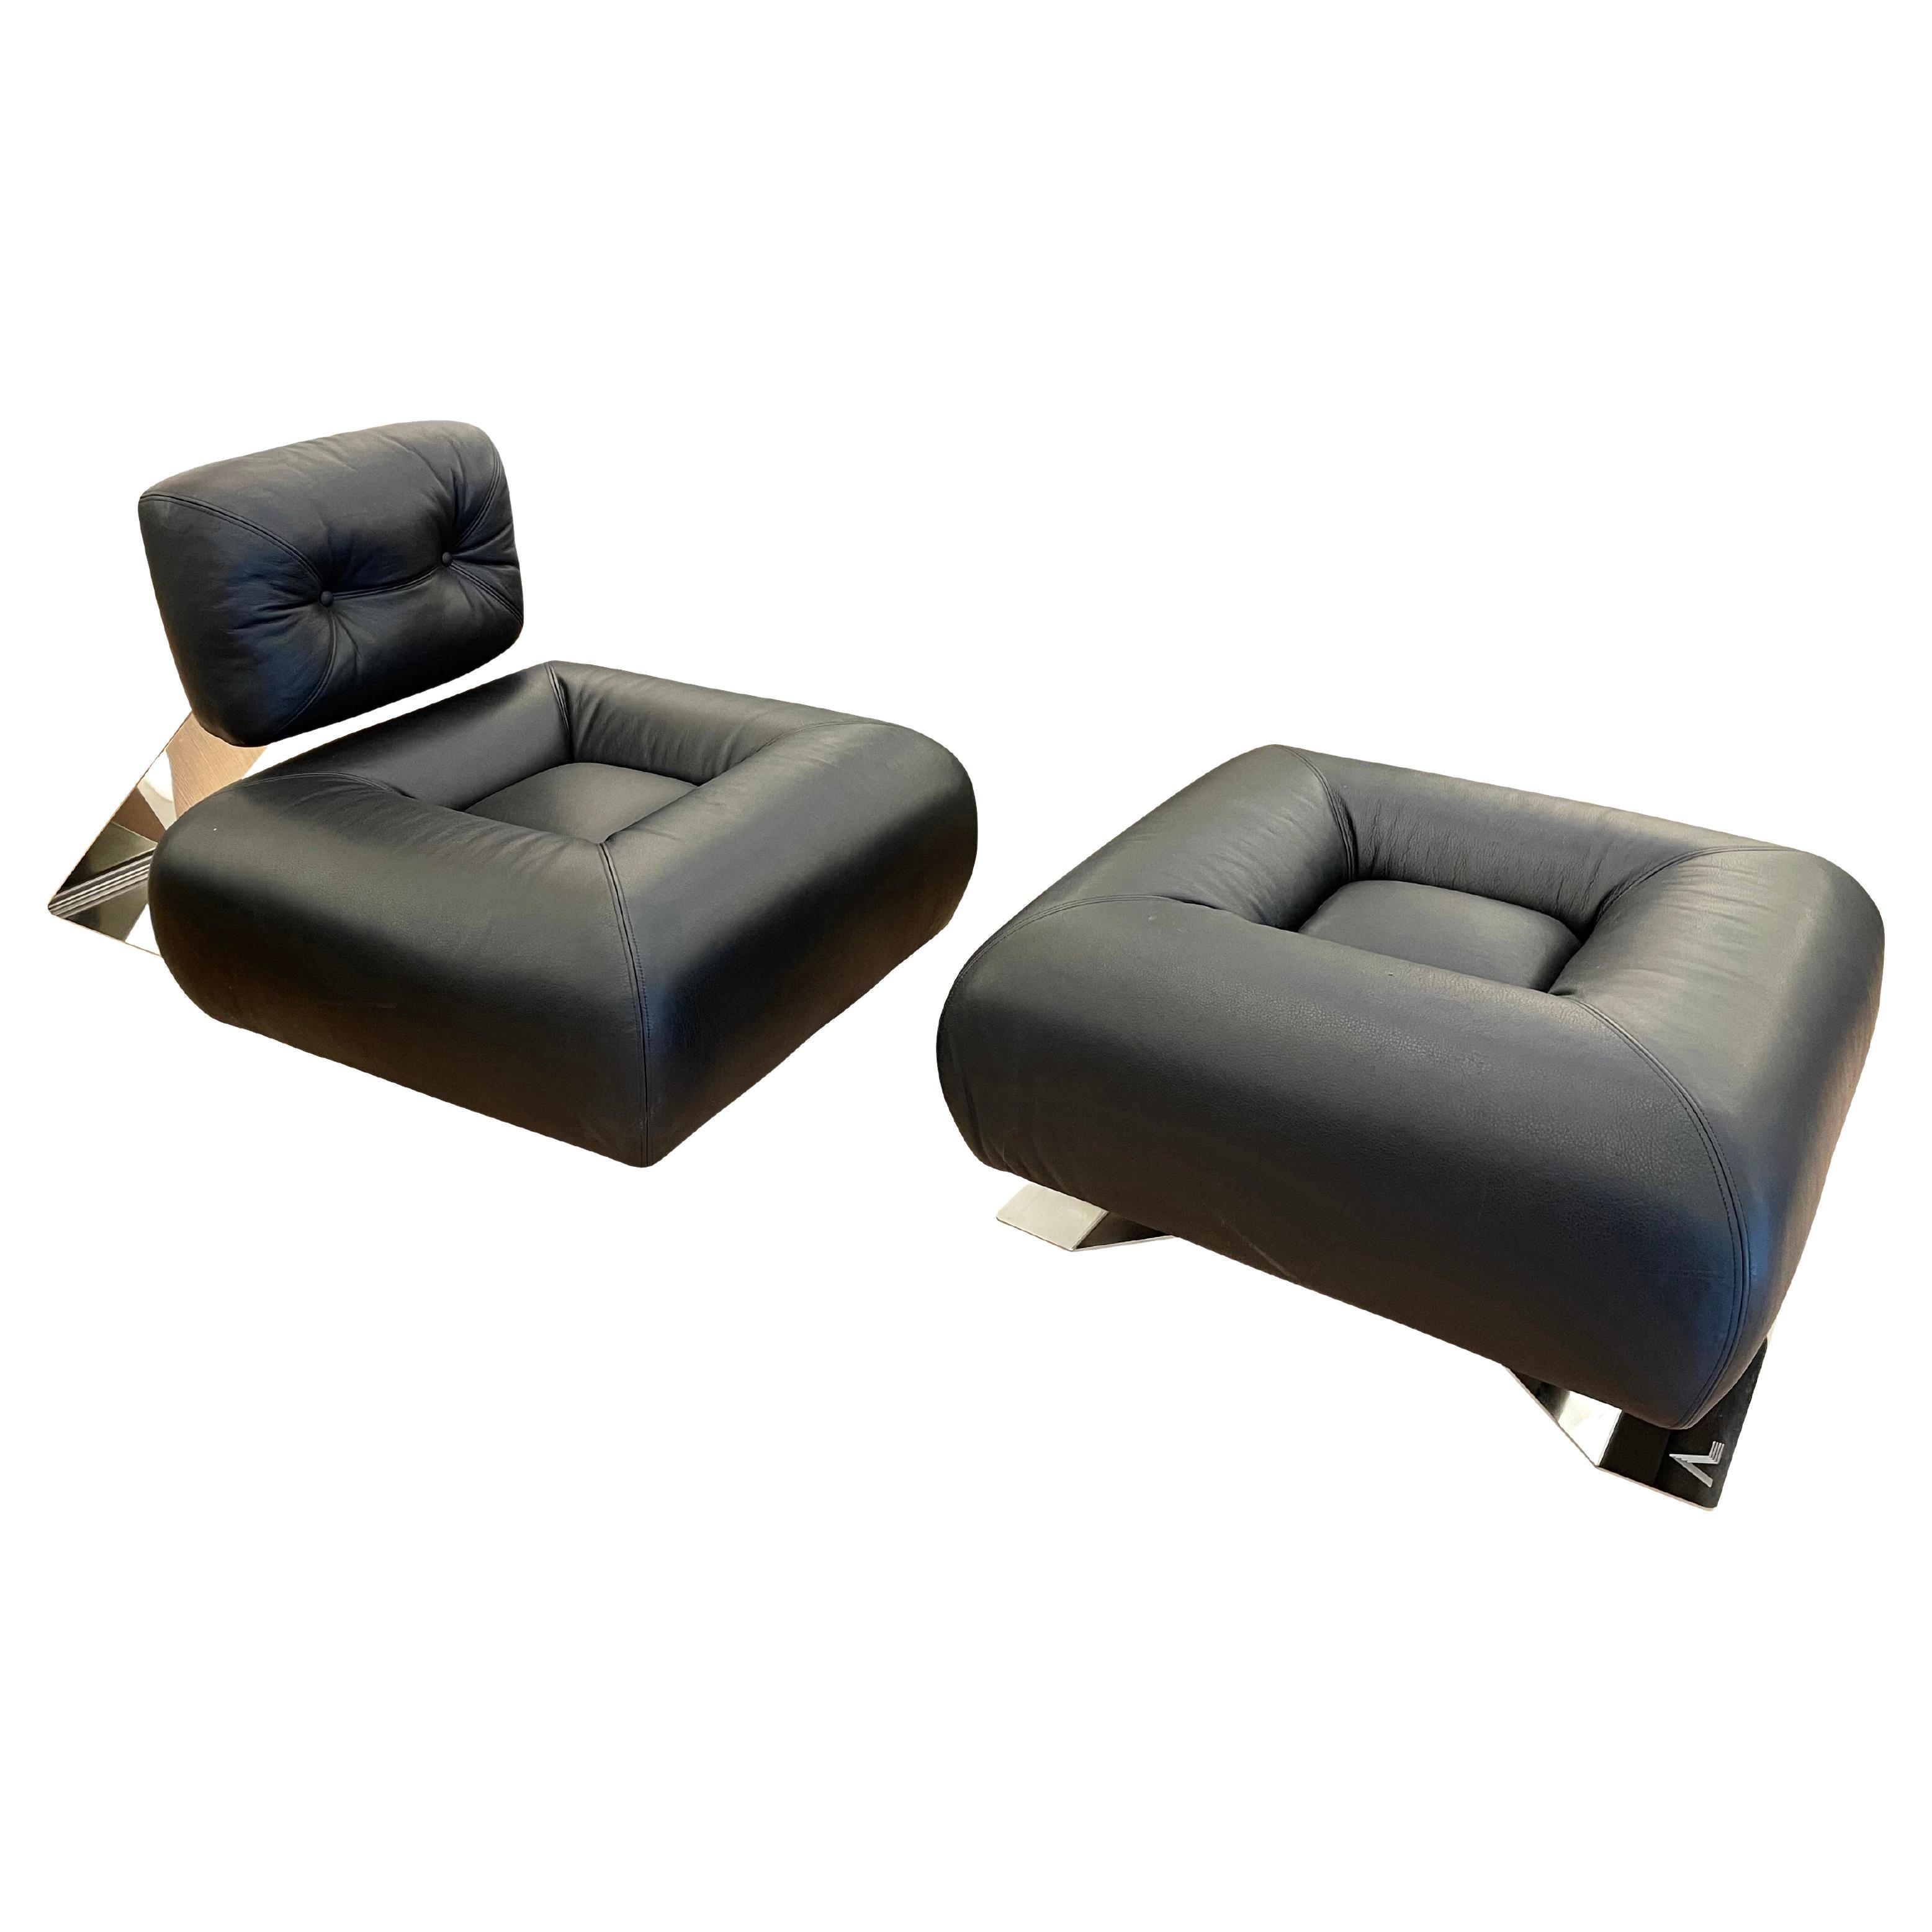 "Oscar Niemeyer ""Aran"" Lounge Chair with Ottoman, 1975"